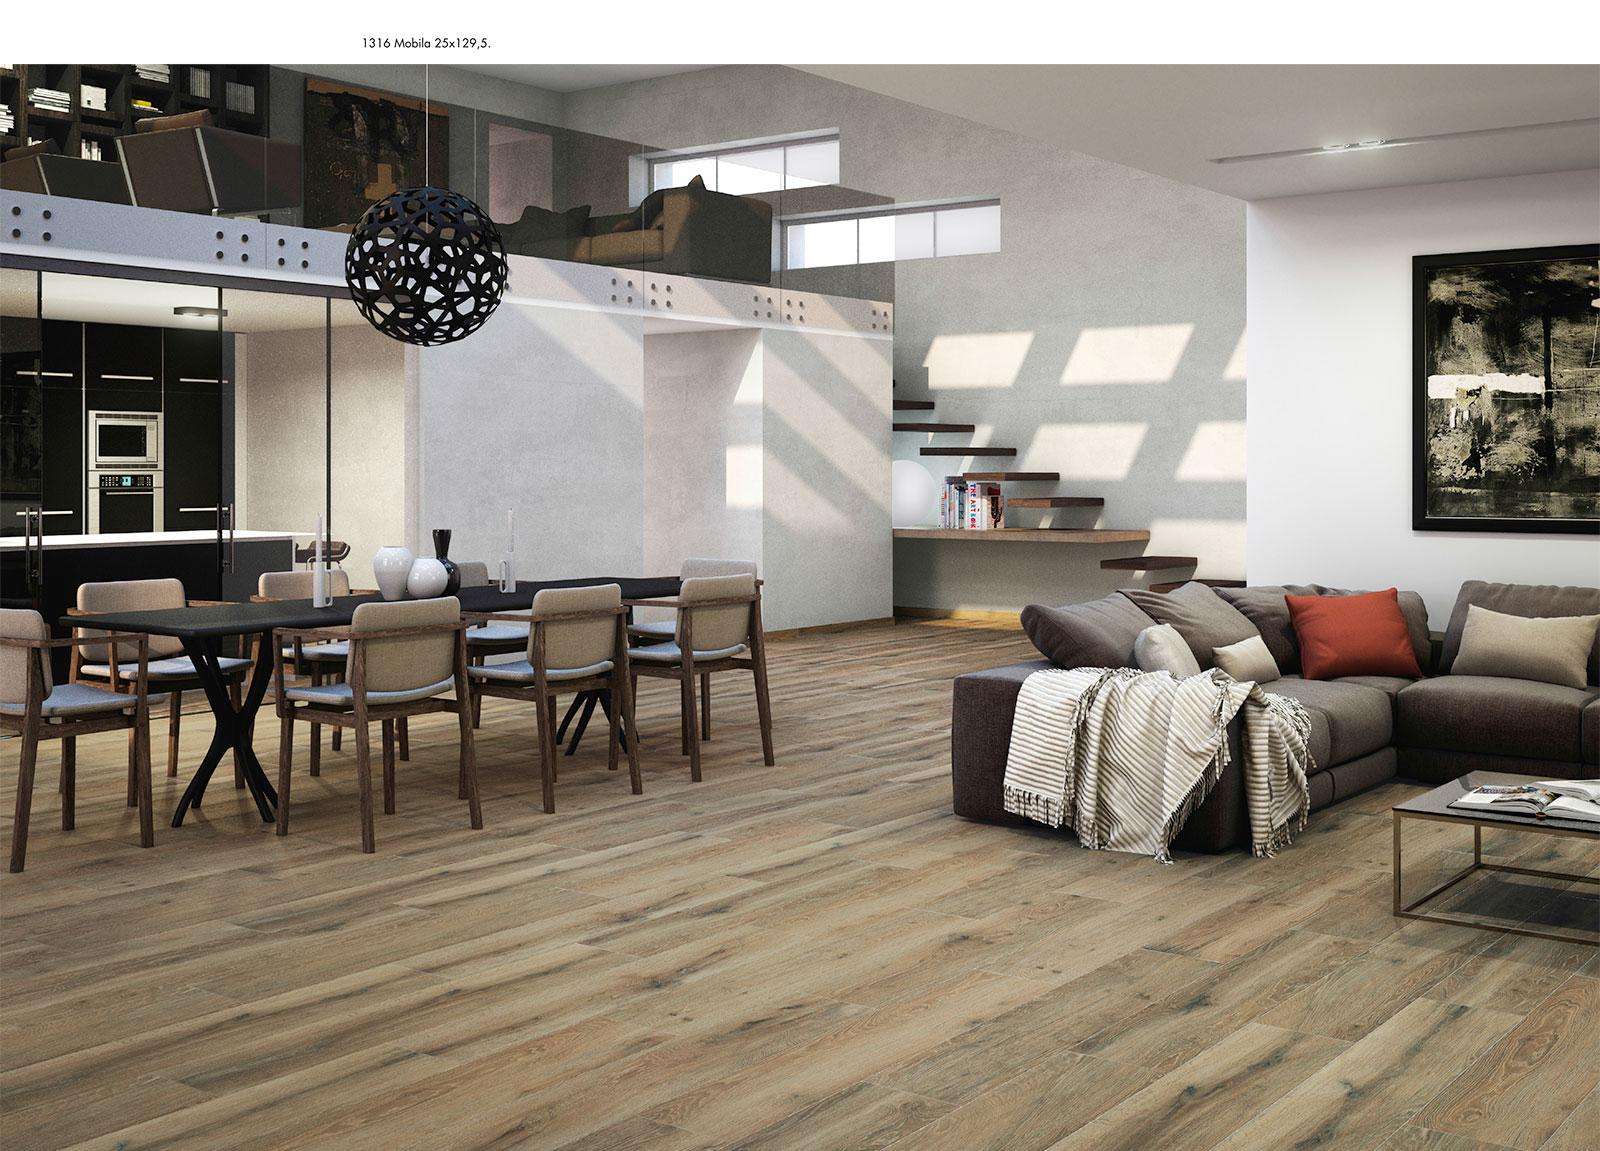 Serie 25x129 1316 azulejos y pavimentos mart n for Azulejos y pavimentos san juan